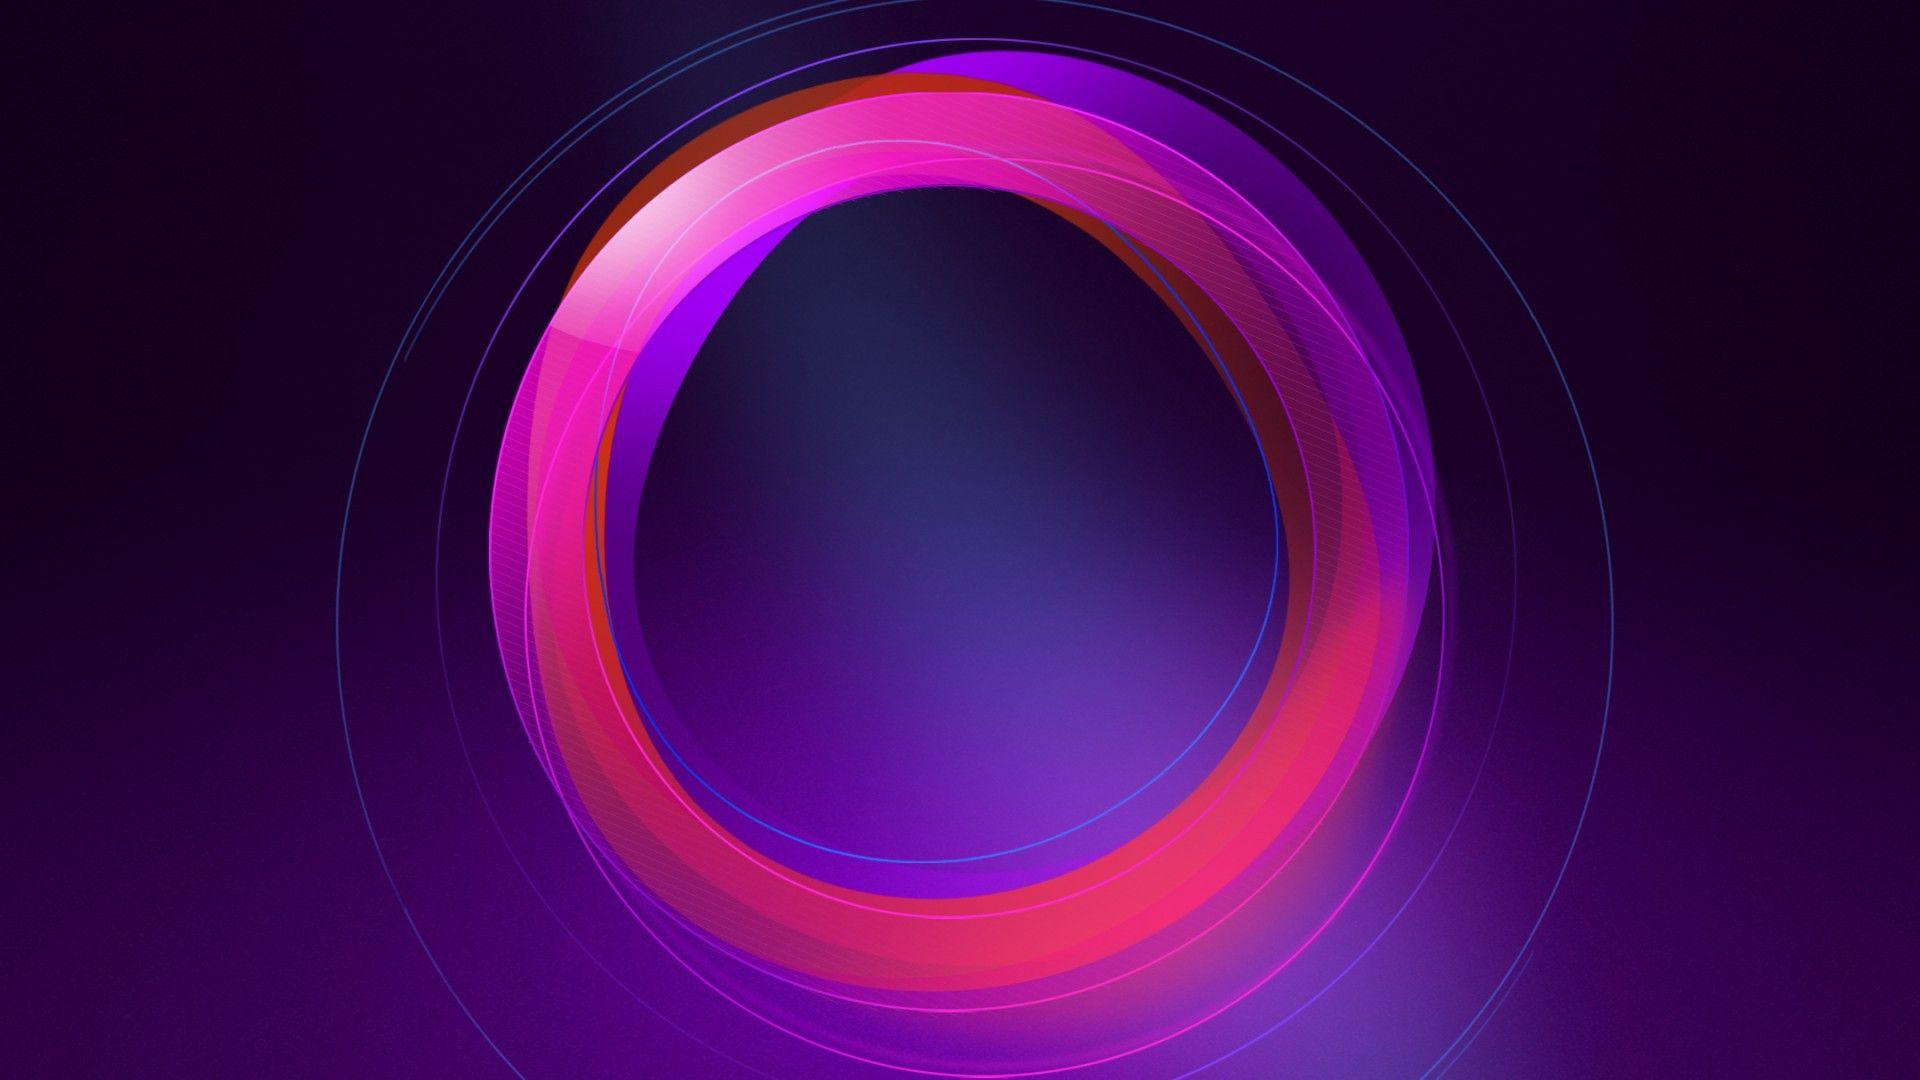 Circle hd wallpaper 1080p for pc